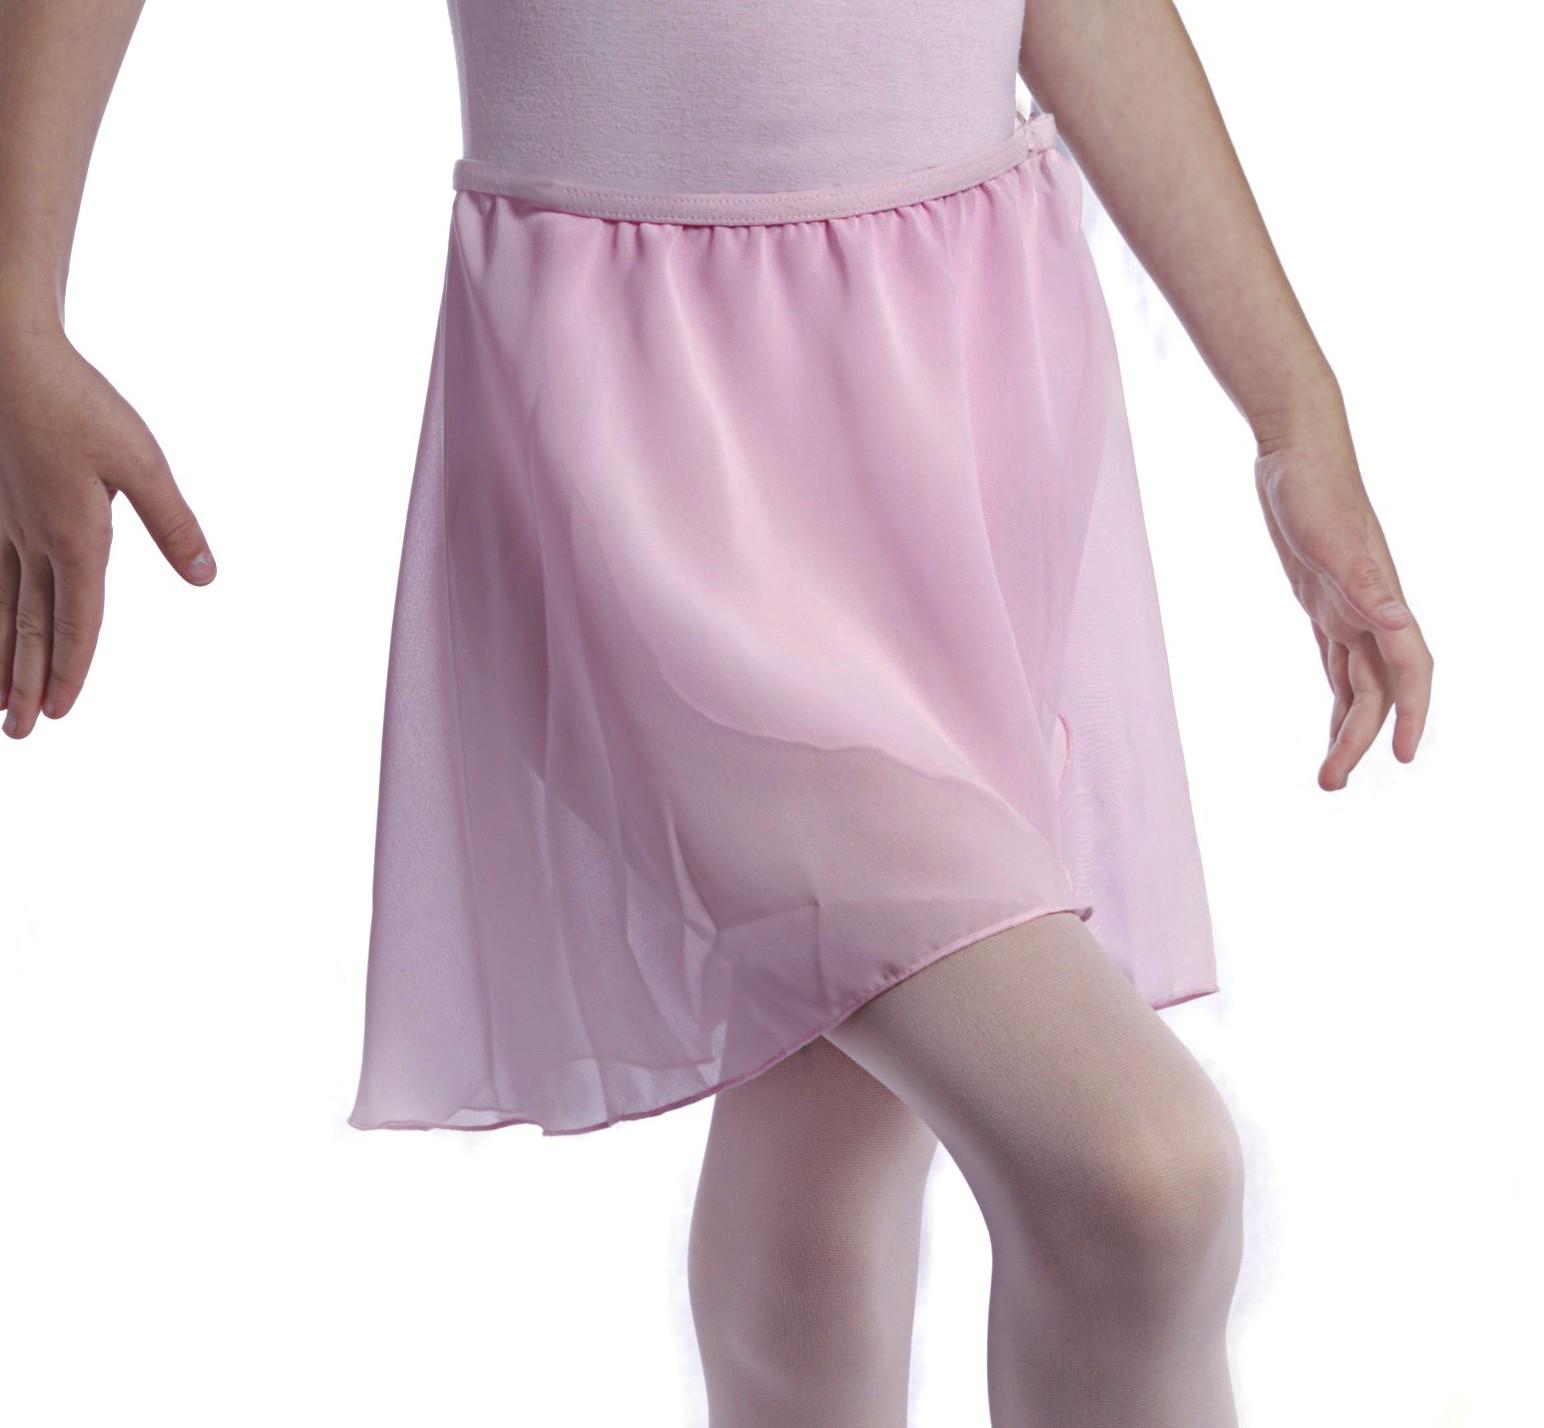 proVora Tulip Wrap Ballet Skirt in Pink. RAD